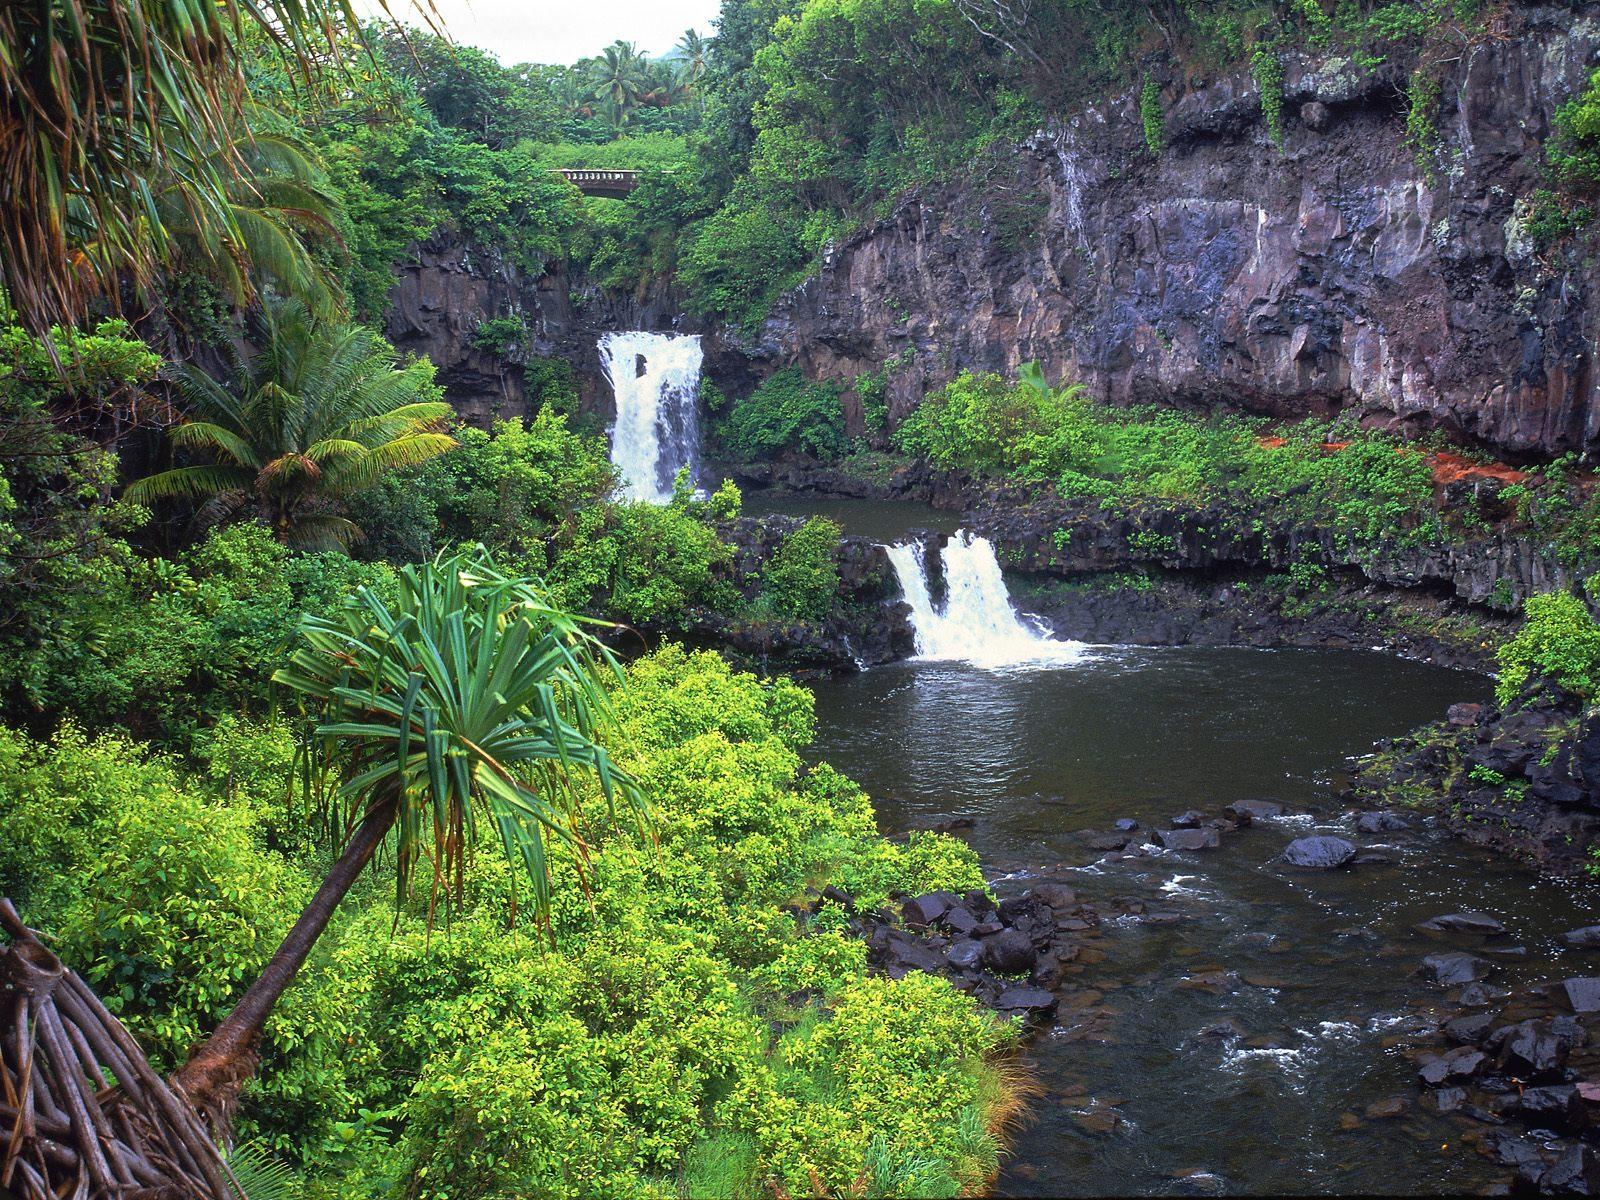 http://4.bp.blogspot.com/-VyT_euZKs0o/TeZbj6W10FI/AAAAAAAAAjU/G8z63JzKbjc/s1600/Pools_of_Oheo_Maui_Hawaii.jpg